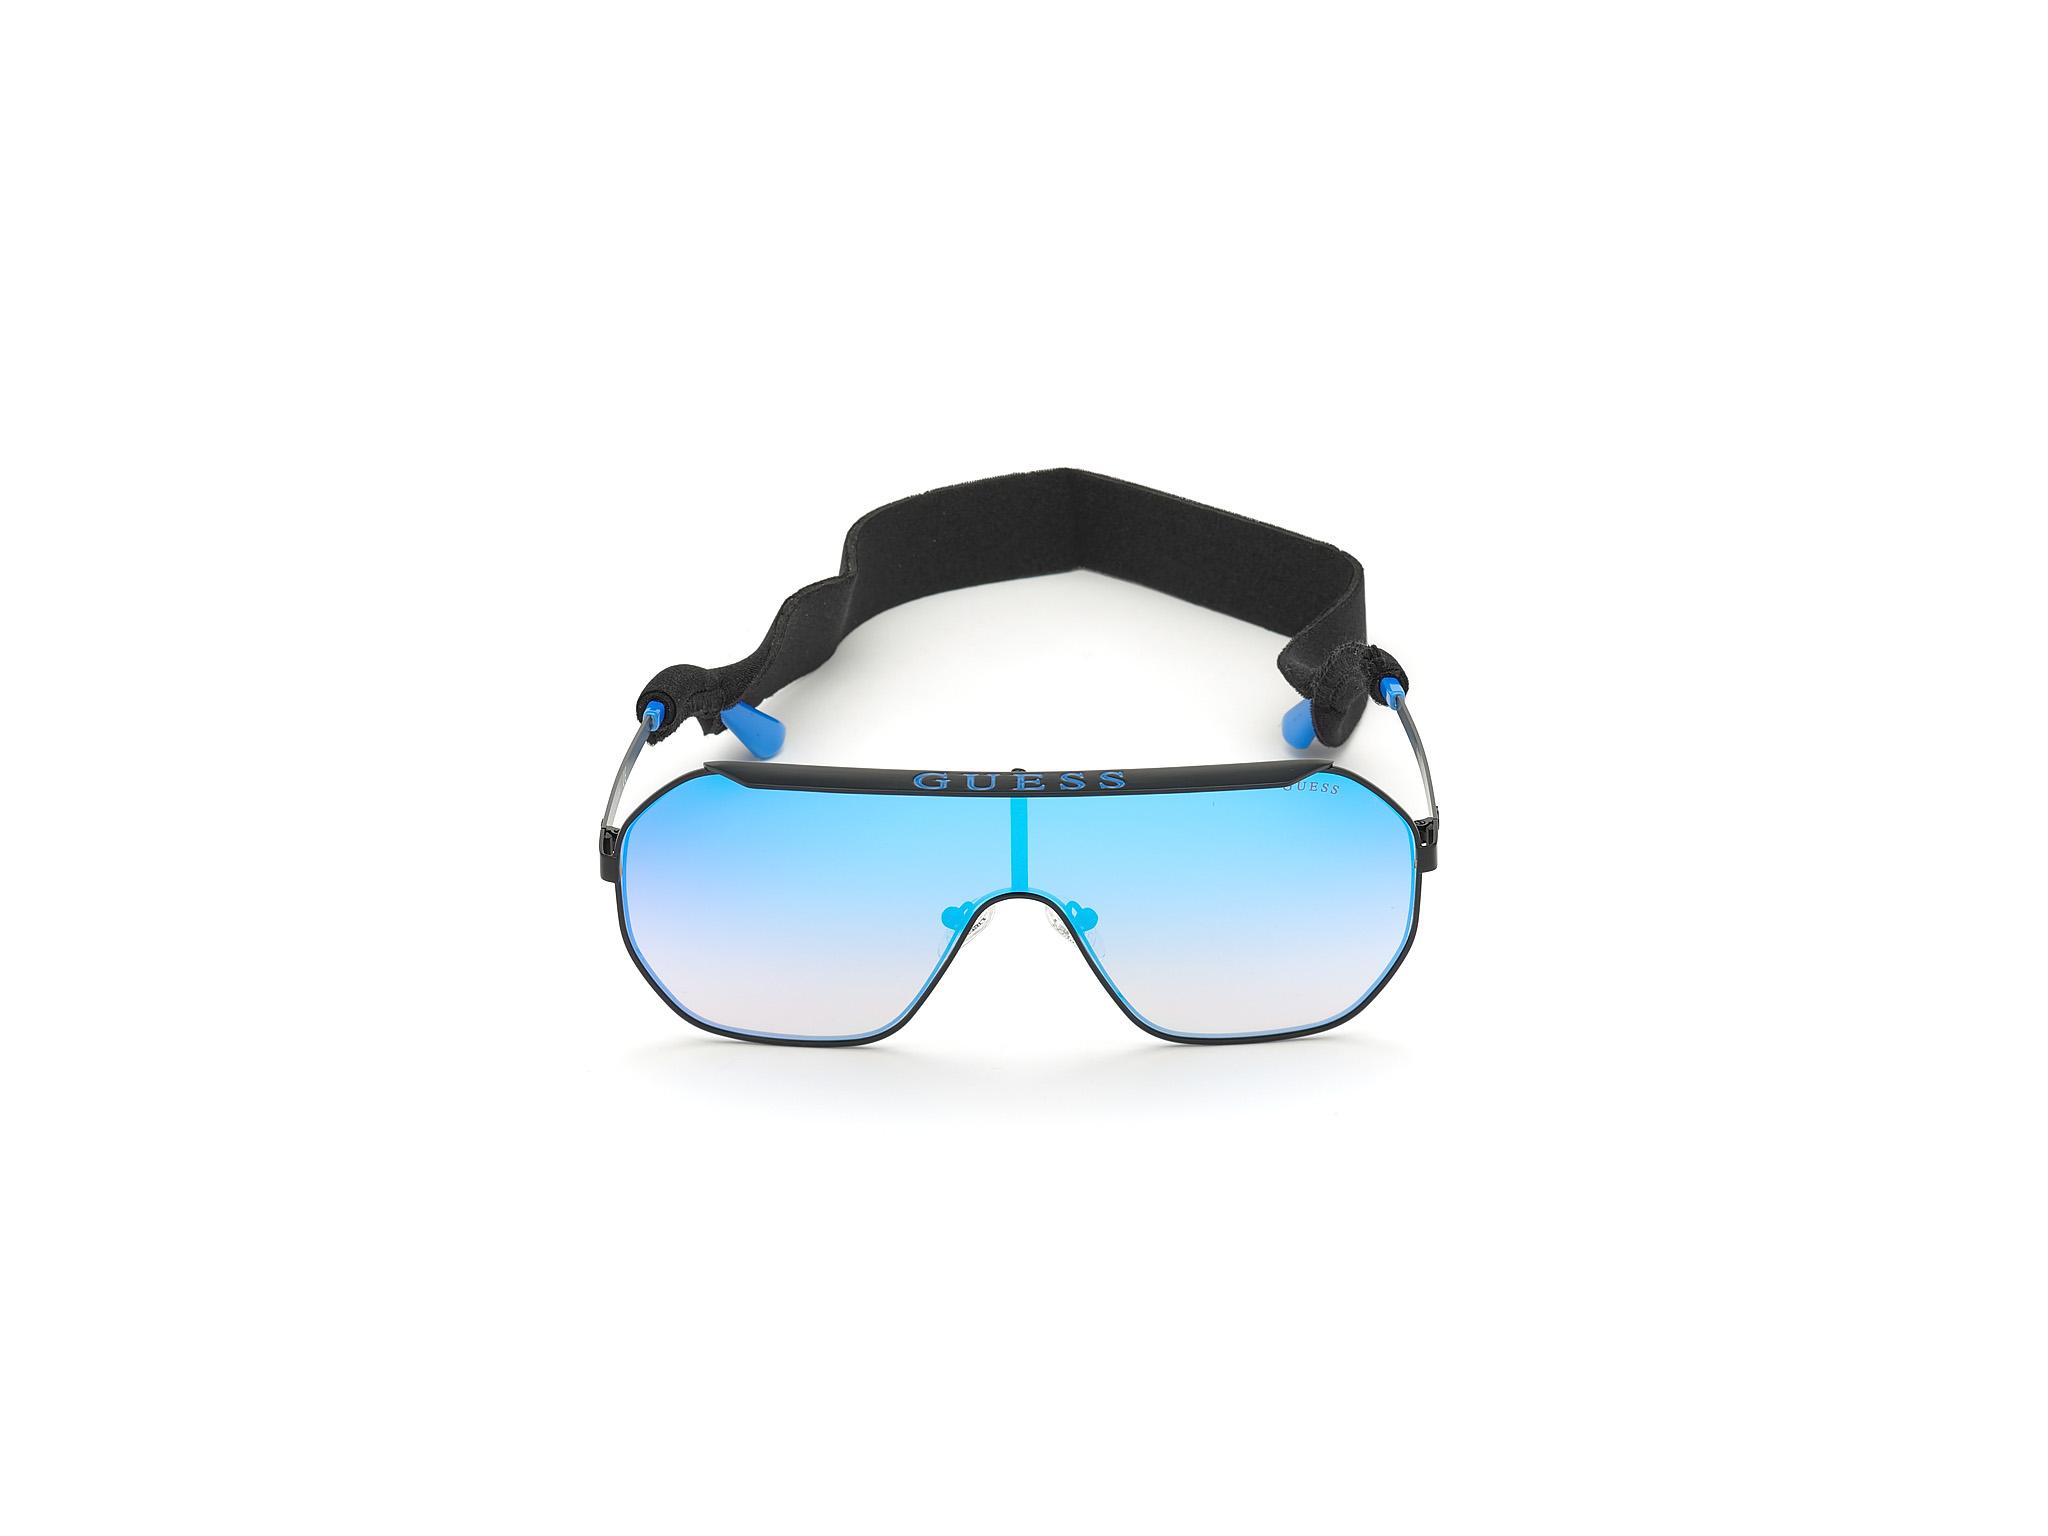 GUESS | Guess Black Frame With Blue Lens Shield Shape Women Sunglass